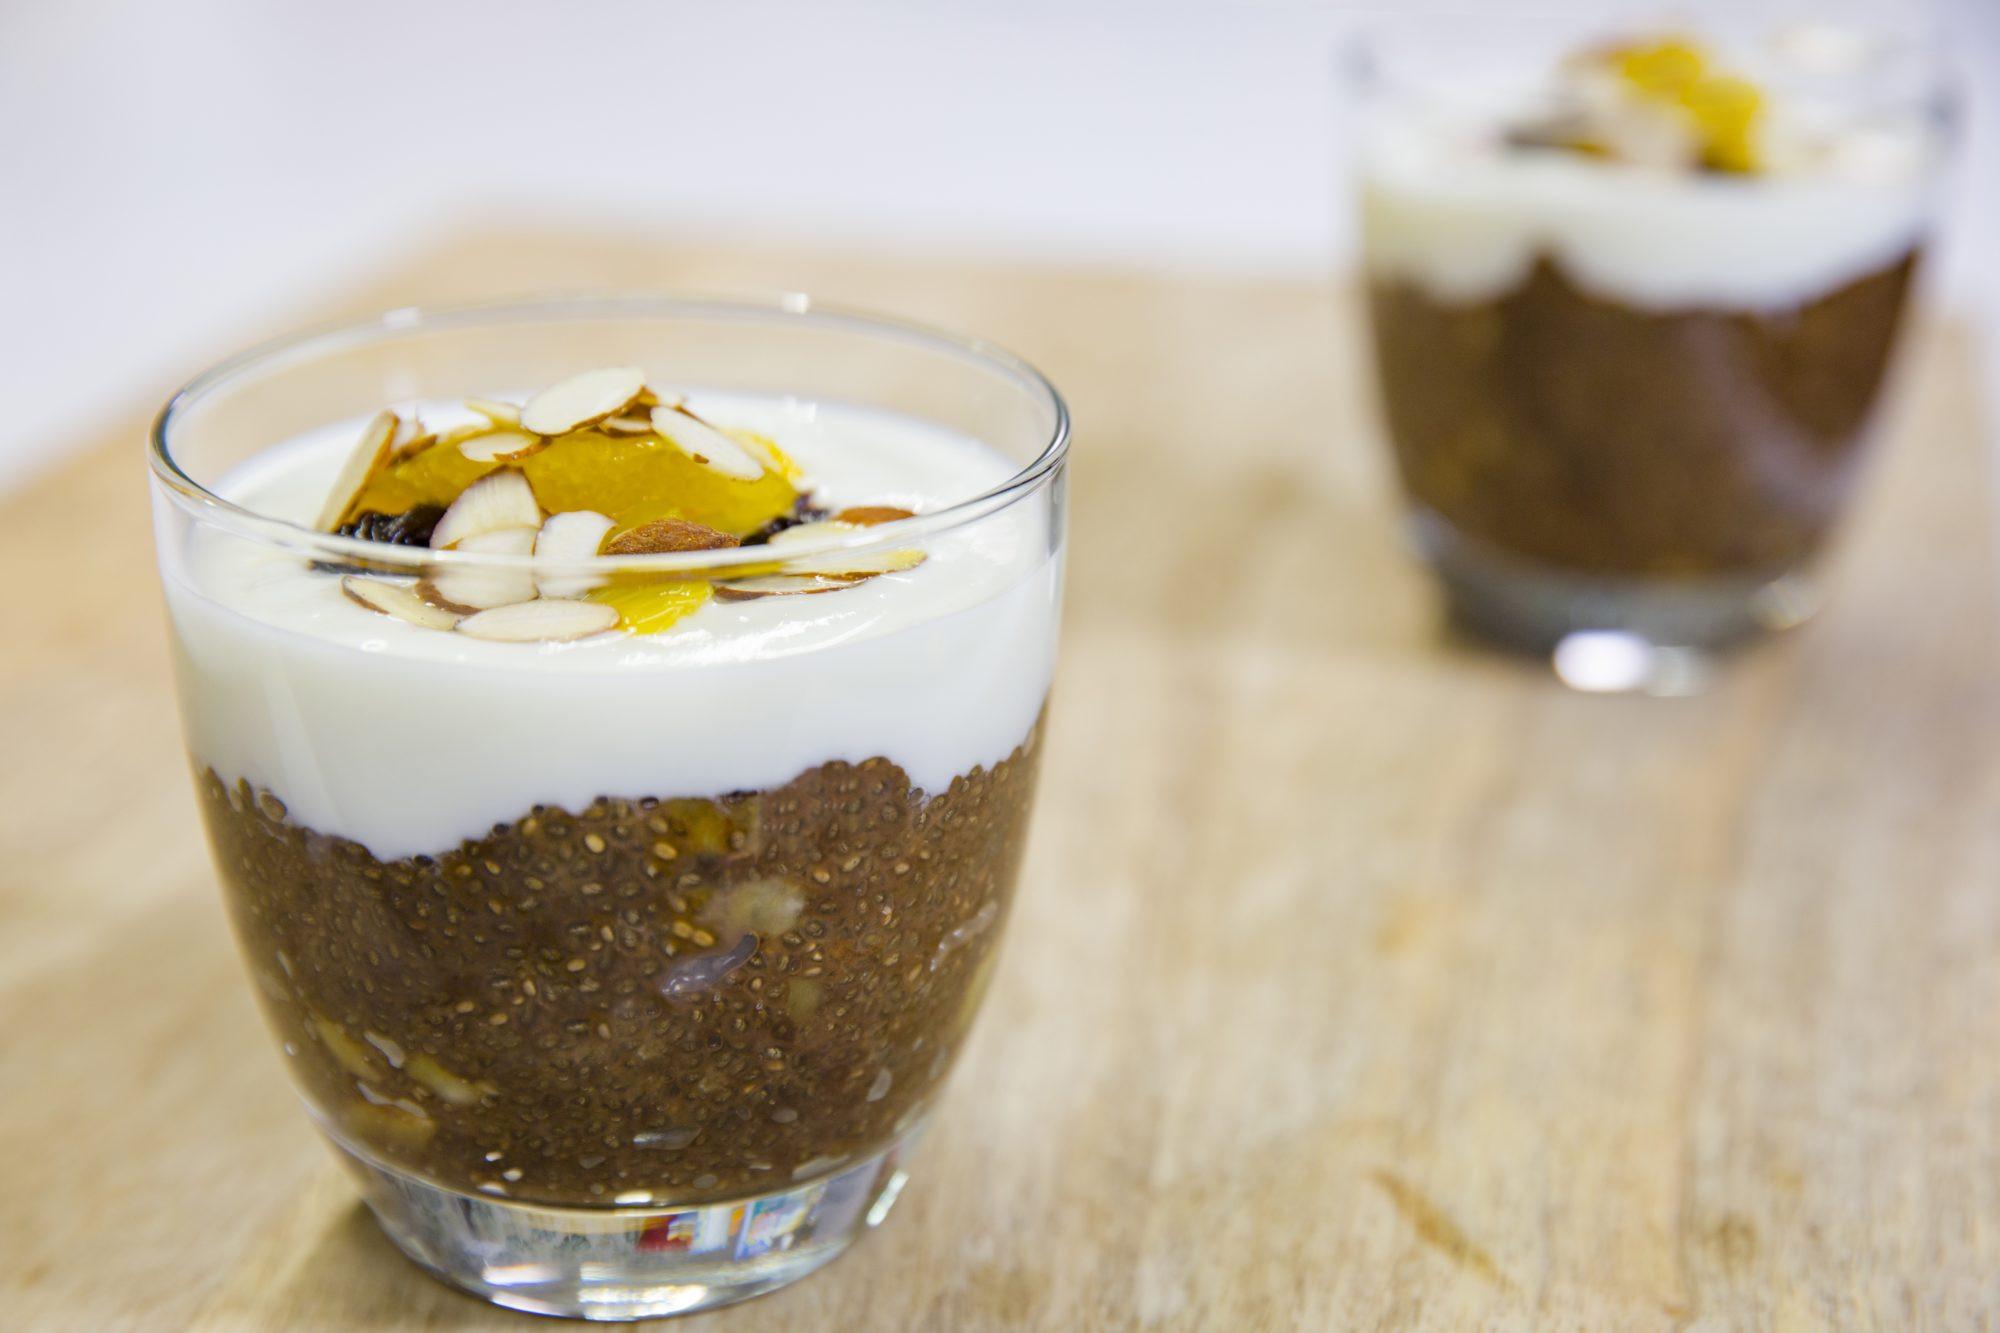 Almond Milk Dessert  Coffee banana and almond milk chia pot dessert